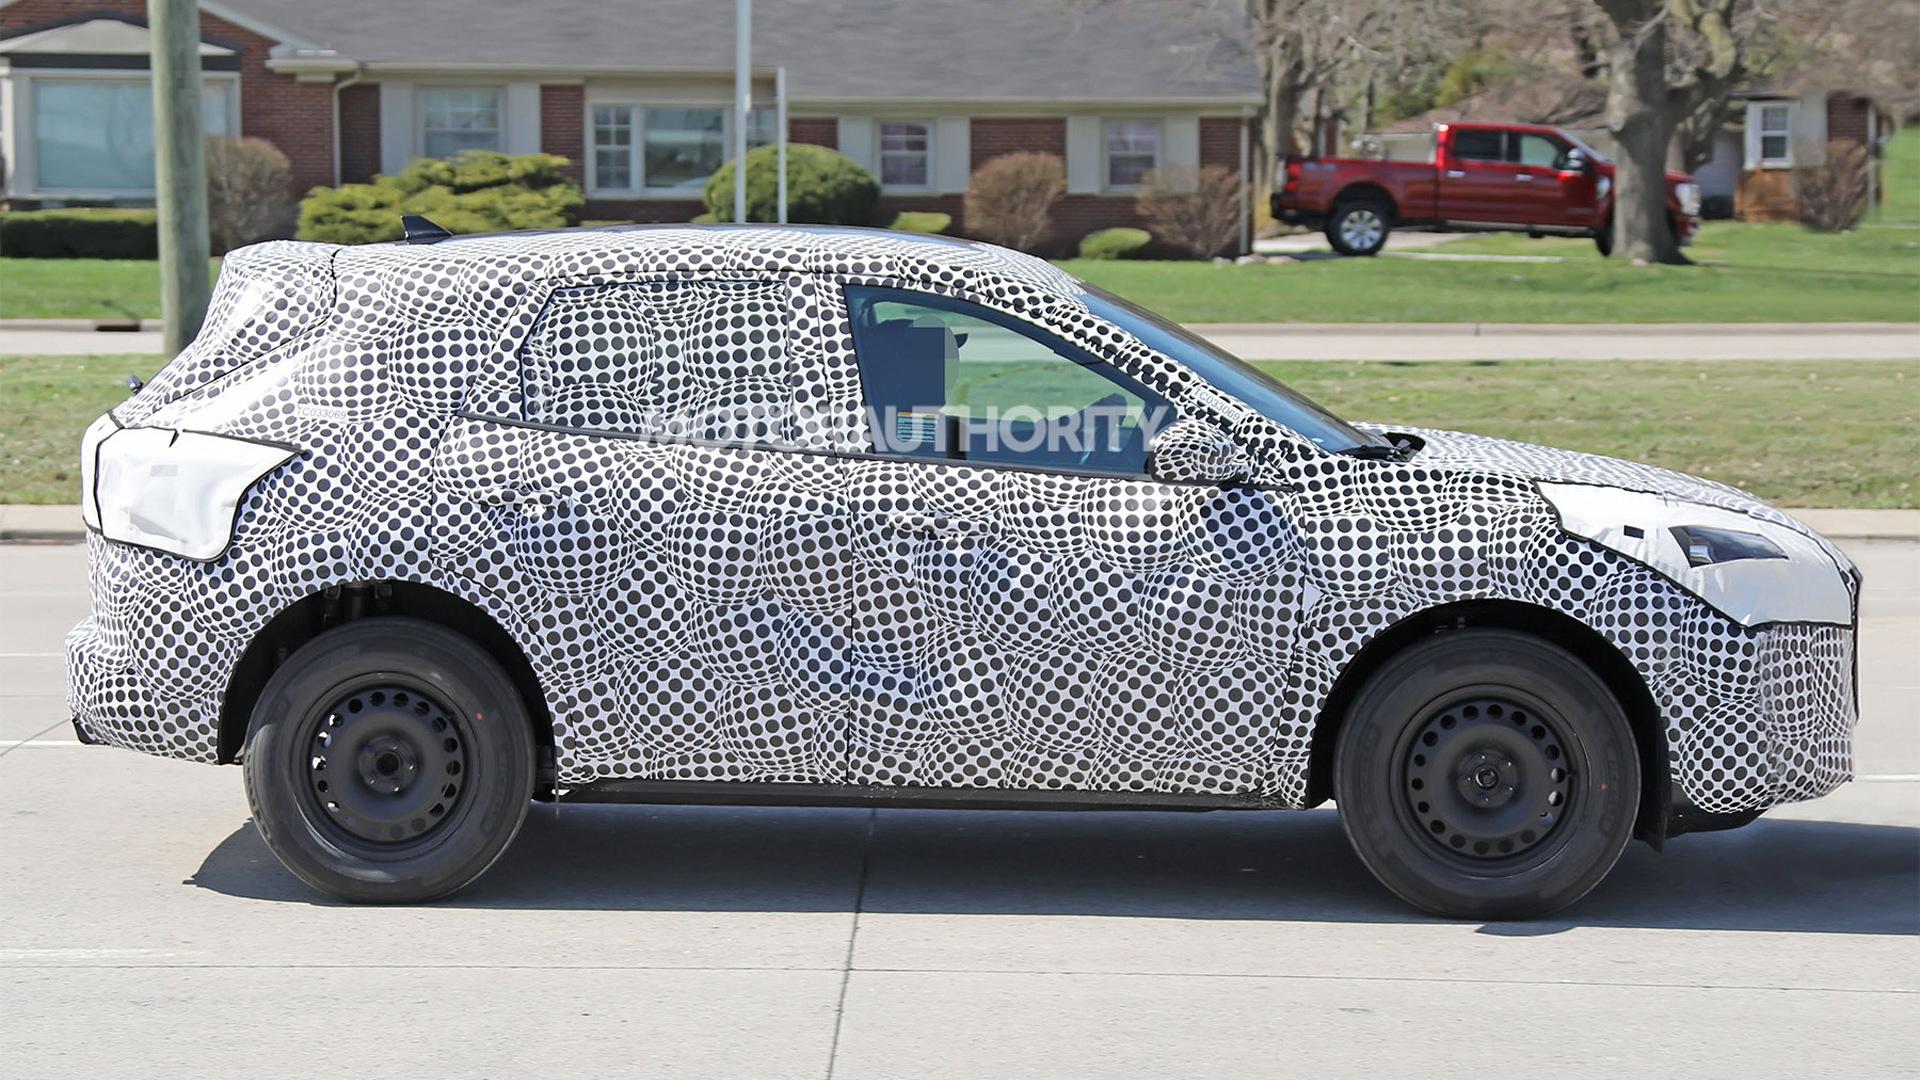 2020 Ford Escape (Kuga) spy shots - Image via S. Baldauf/SB-Medien